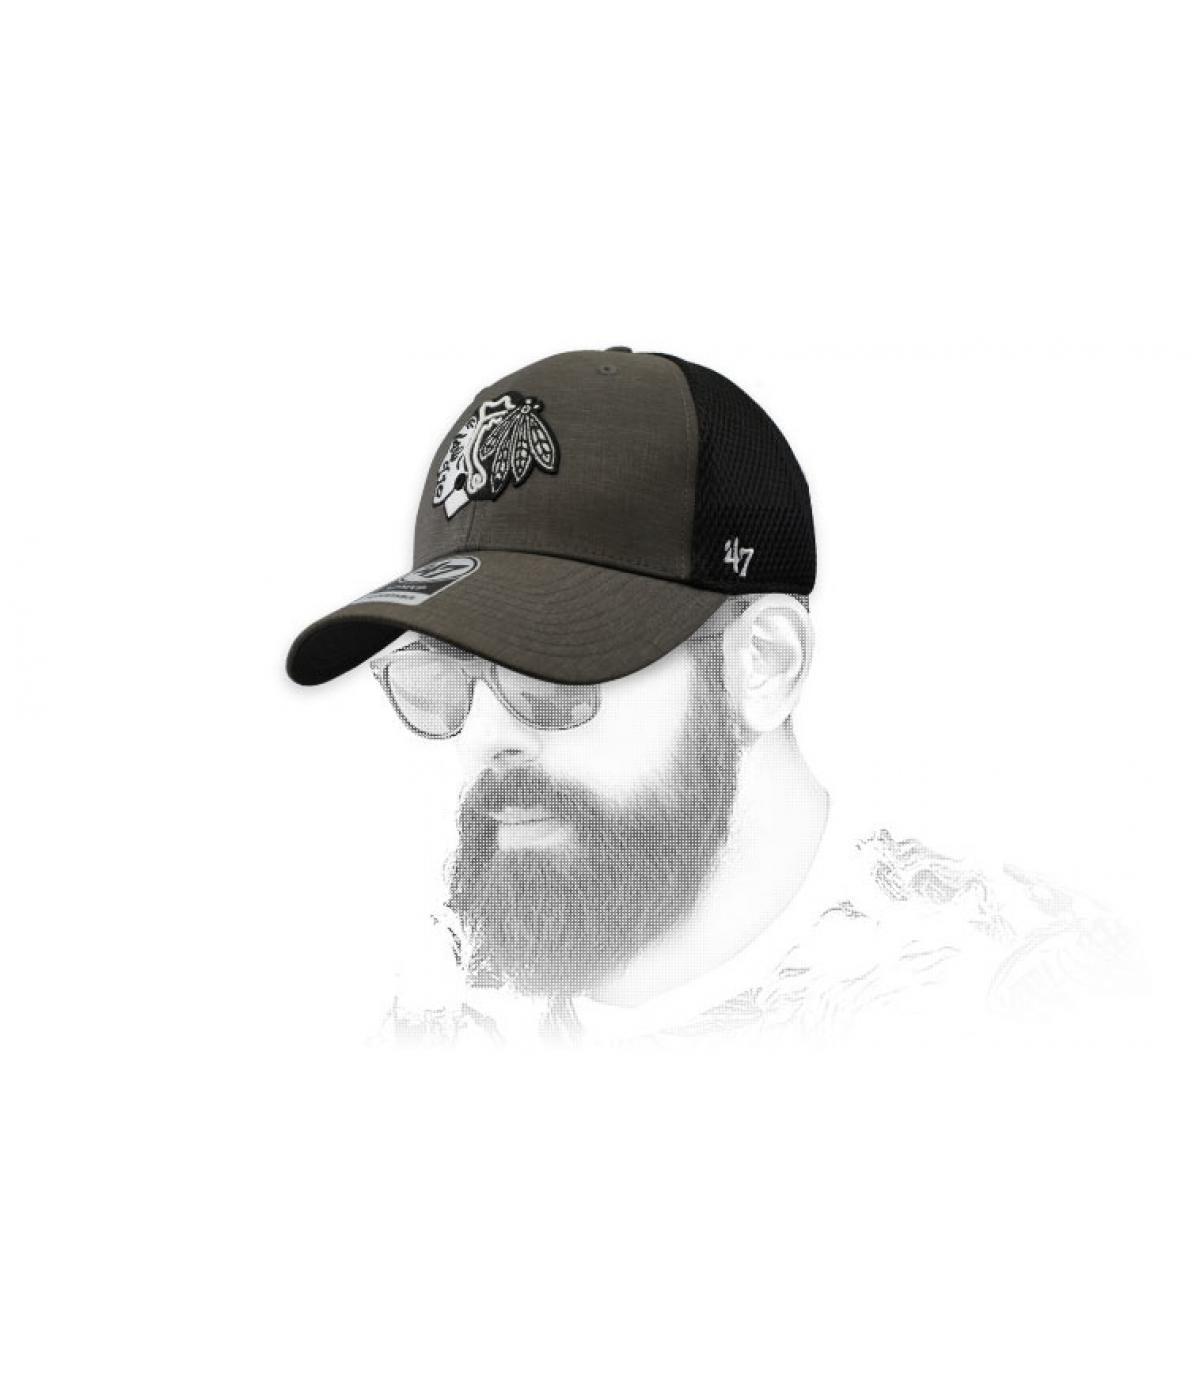 Blackhawks berretto nero grigio